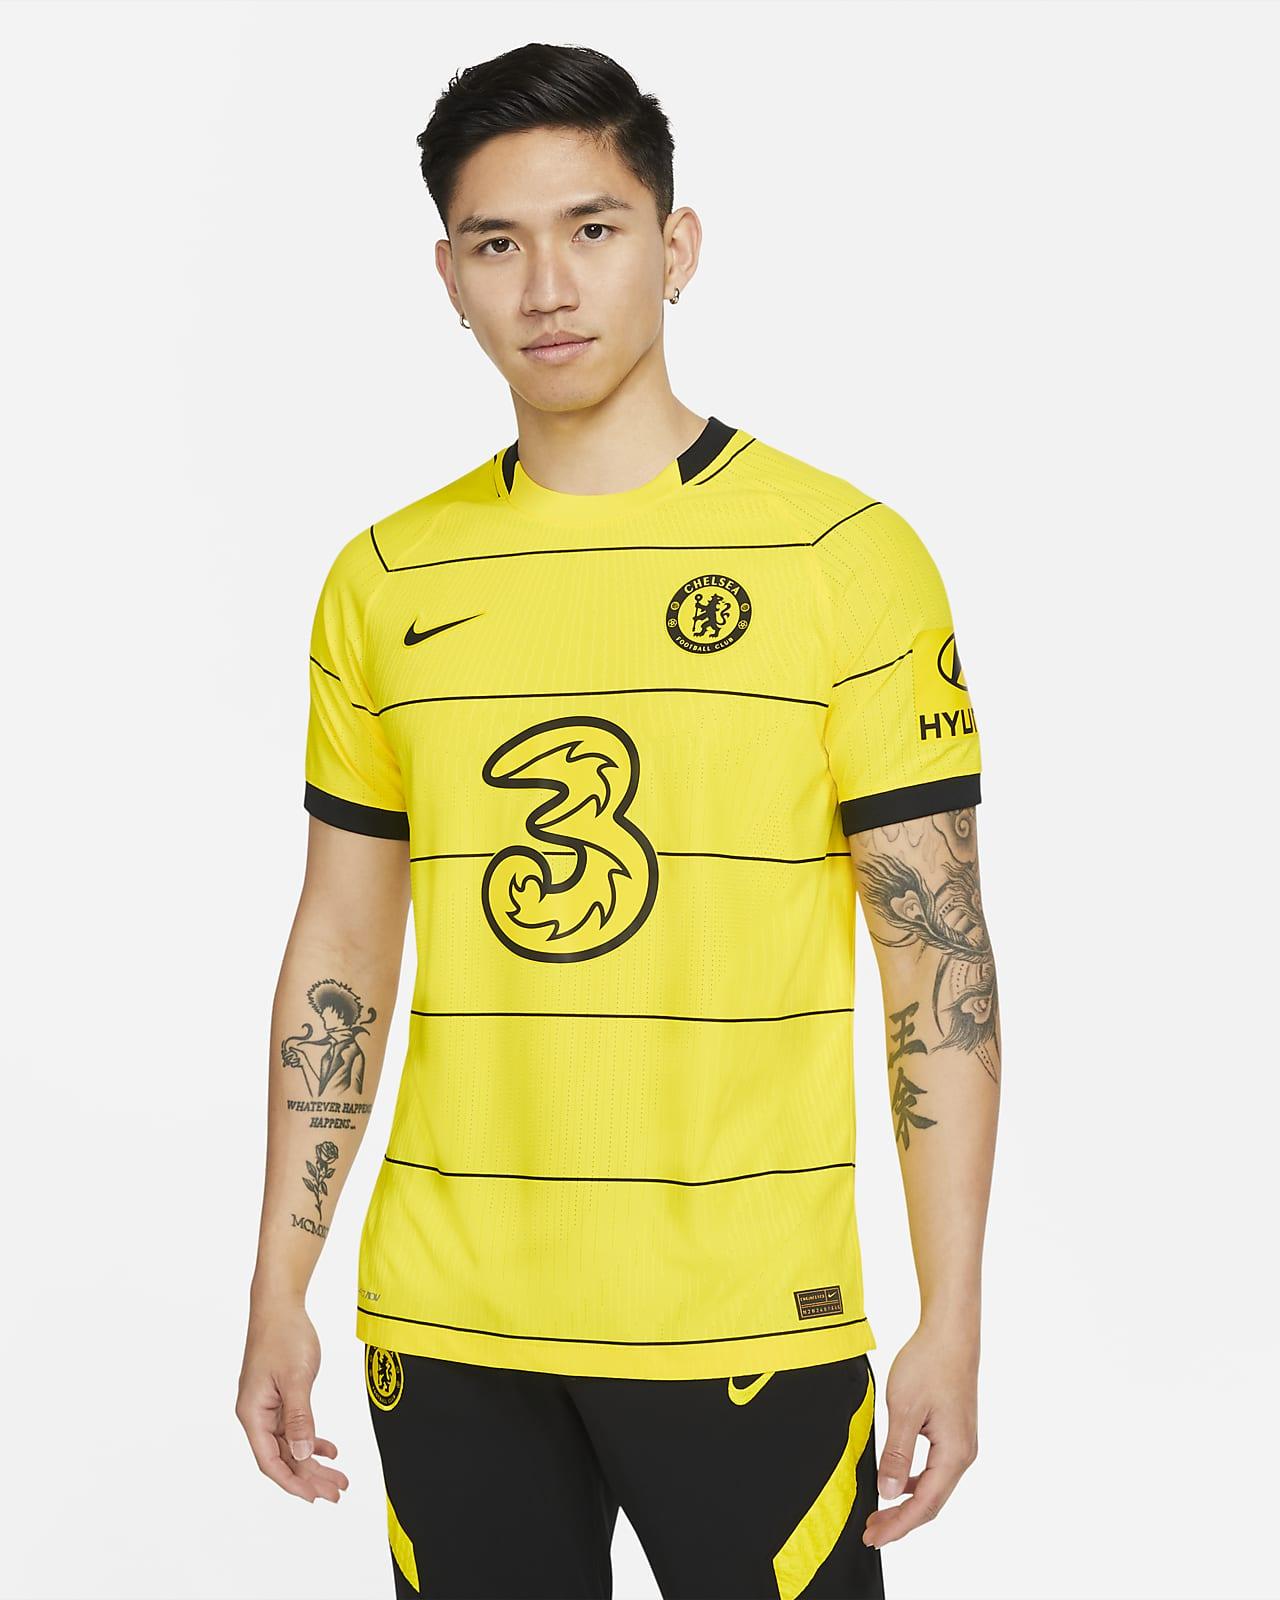 Jersey de fútbol Nike Dri-FIT ADV del Chelsea FC visitante 2021/22 Match para hombre